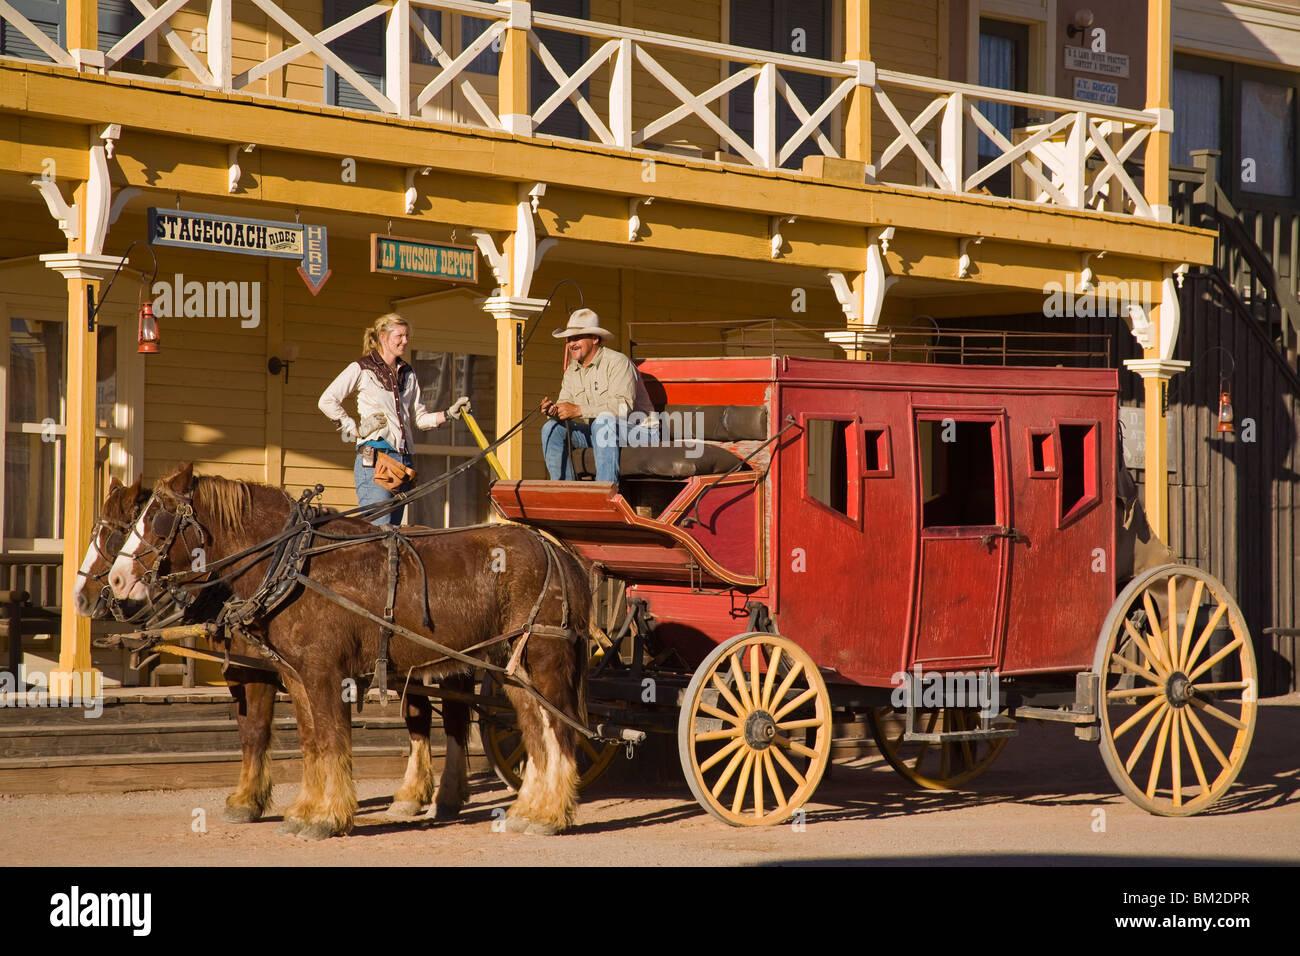 Wagon in Old Tucson Studios, Tucson, Arizona, USA - Stock Image